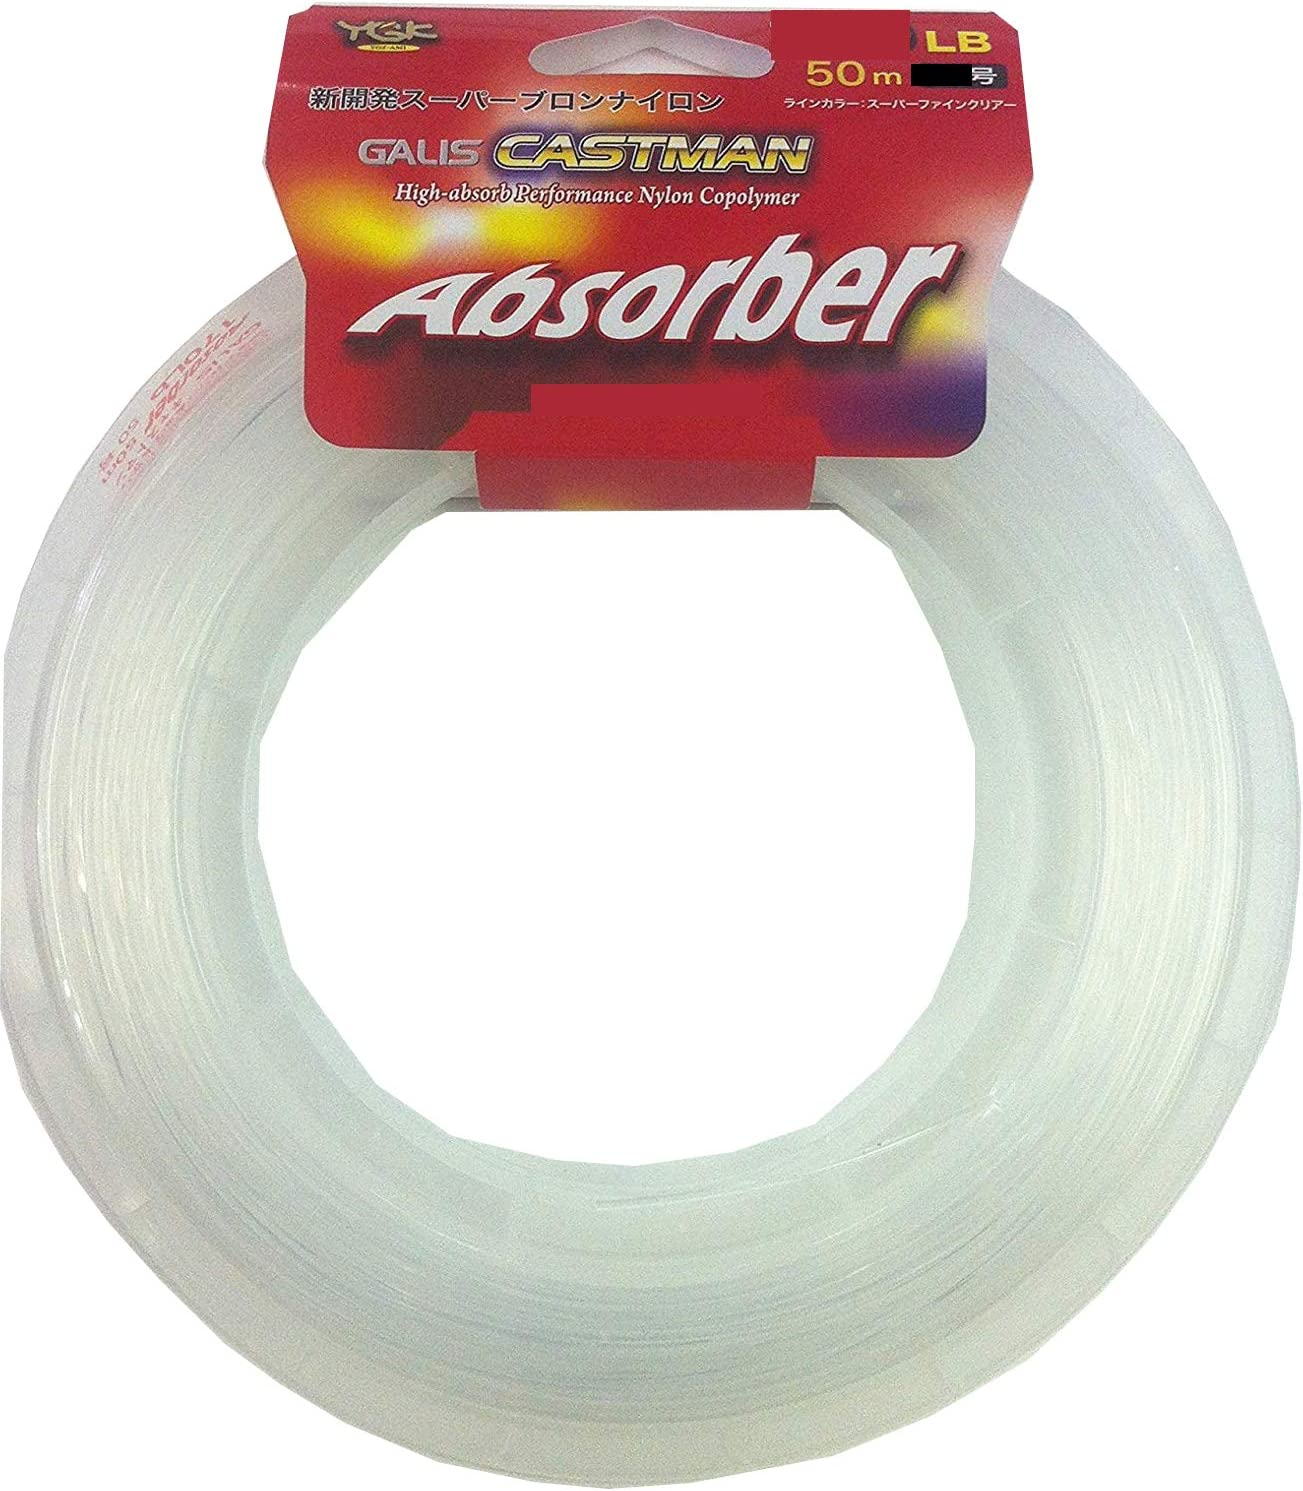 YGK Absorber Castman Nylon Shock Leader Line 50m 100lb 9922